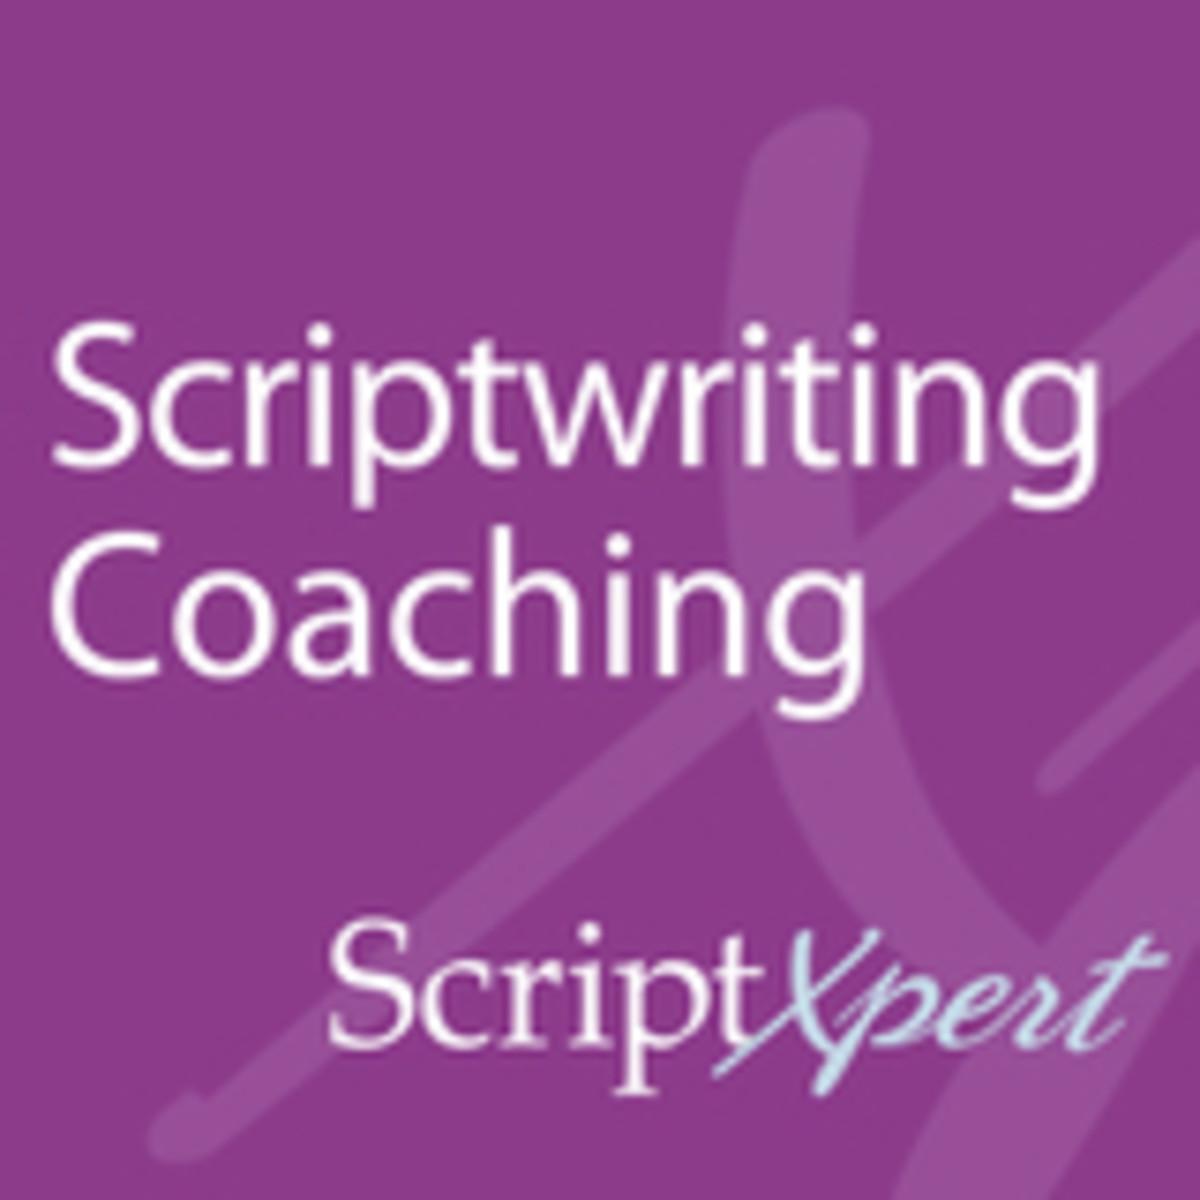 scriptxpert-scriptwriting-coaching_tiny